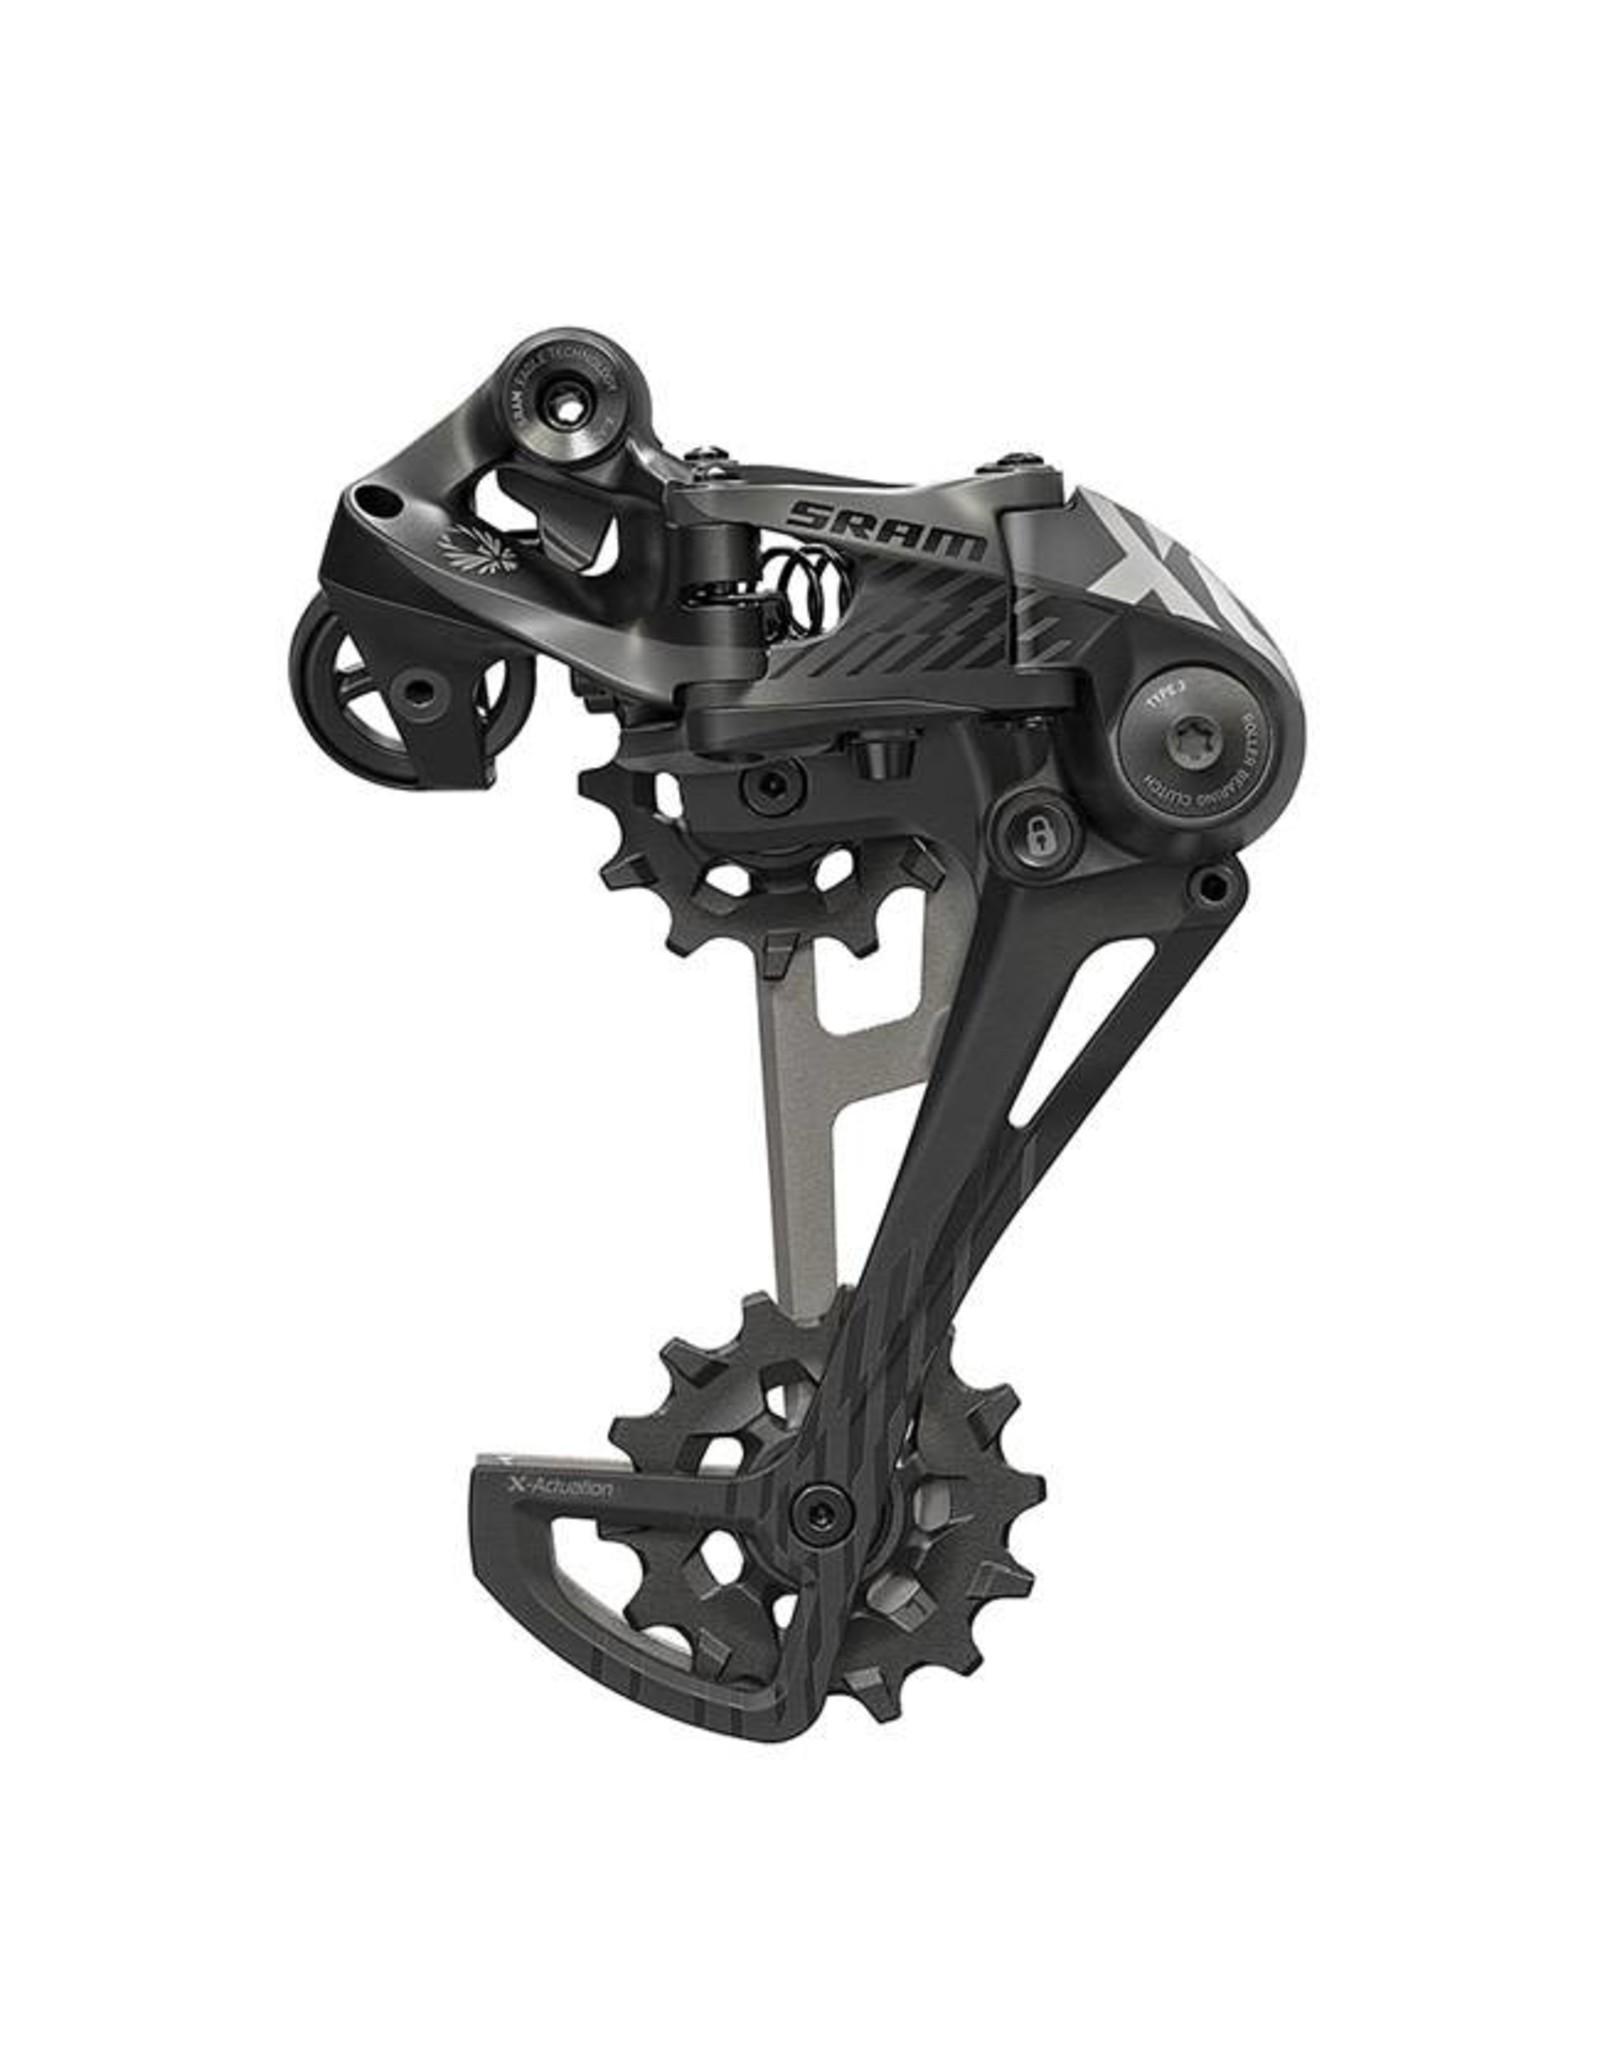 SRAM SRAM X01 Eagle 12-Speed Type 3 Rear Derailleur, Black